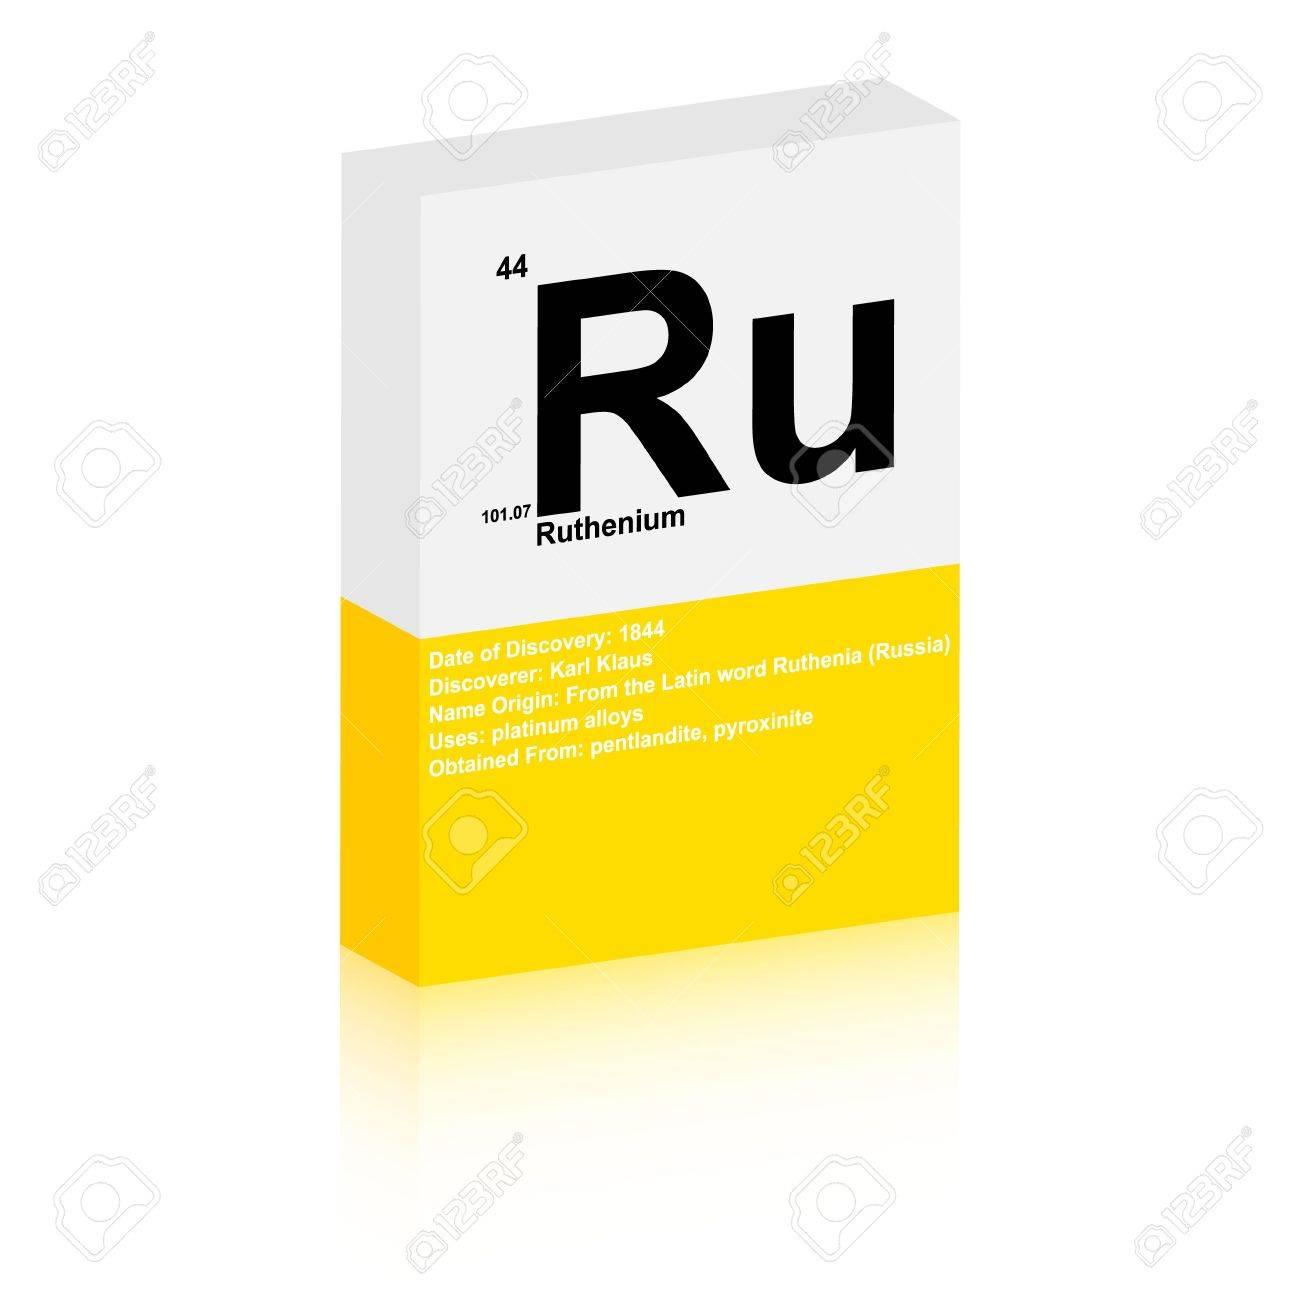 Ruthenium Symbol Royalty Free Cliparts Vectors And Stock